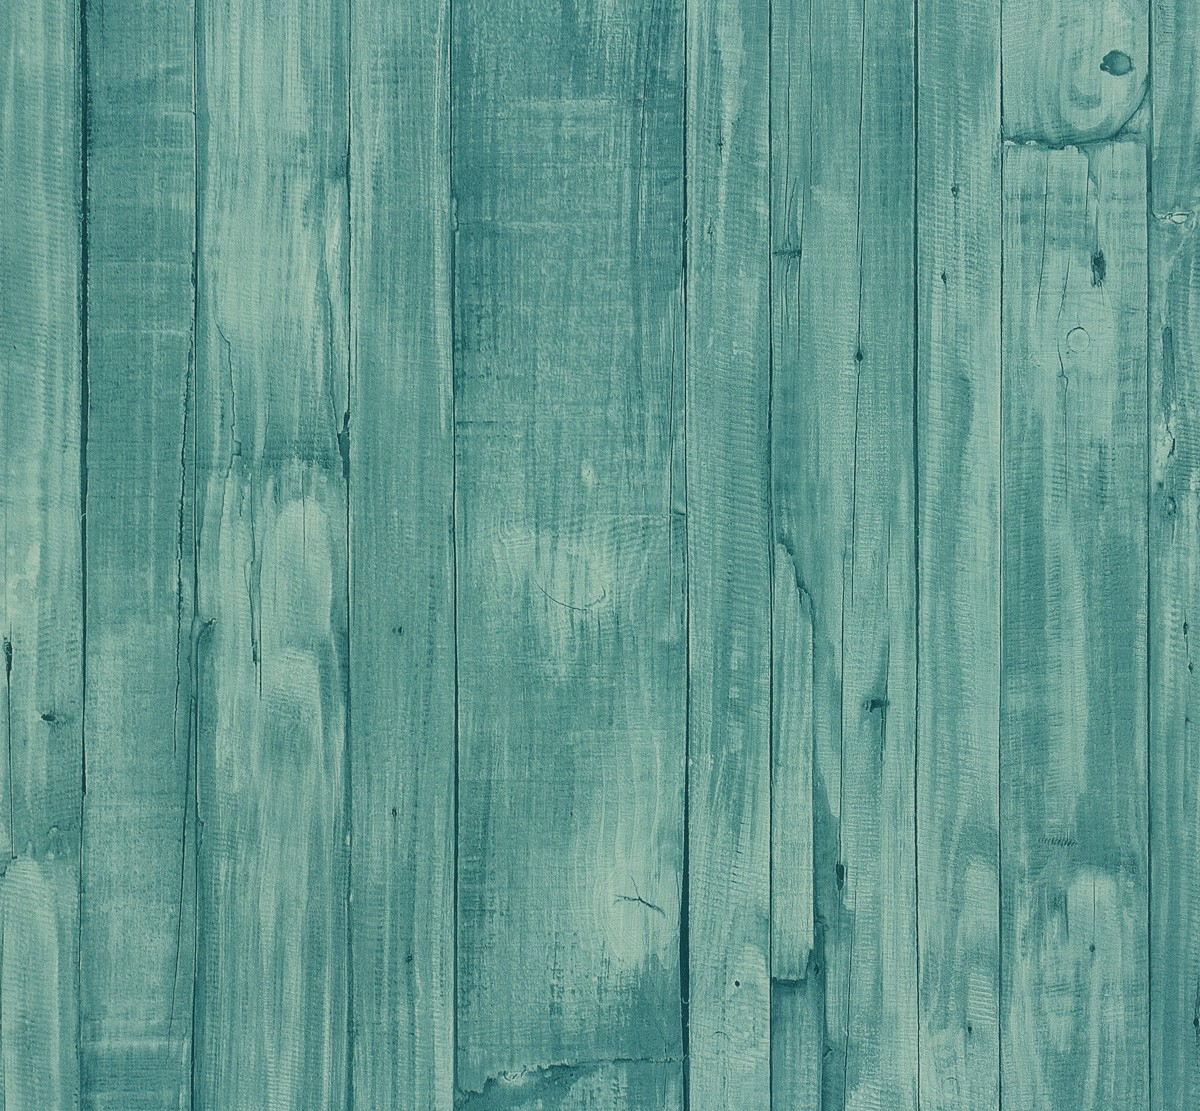 wallpaper wood turquoise 42104 60 4210460 vintage non. Black Bedroom Furniture Sets. Home Design Ideas